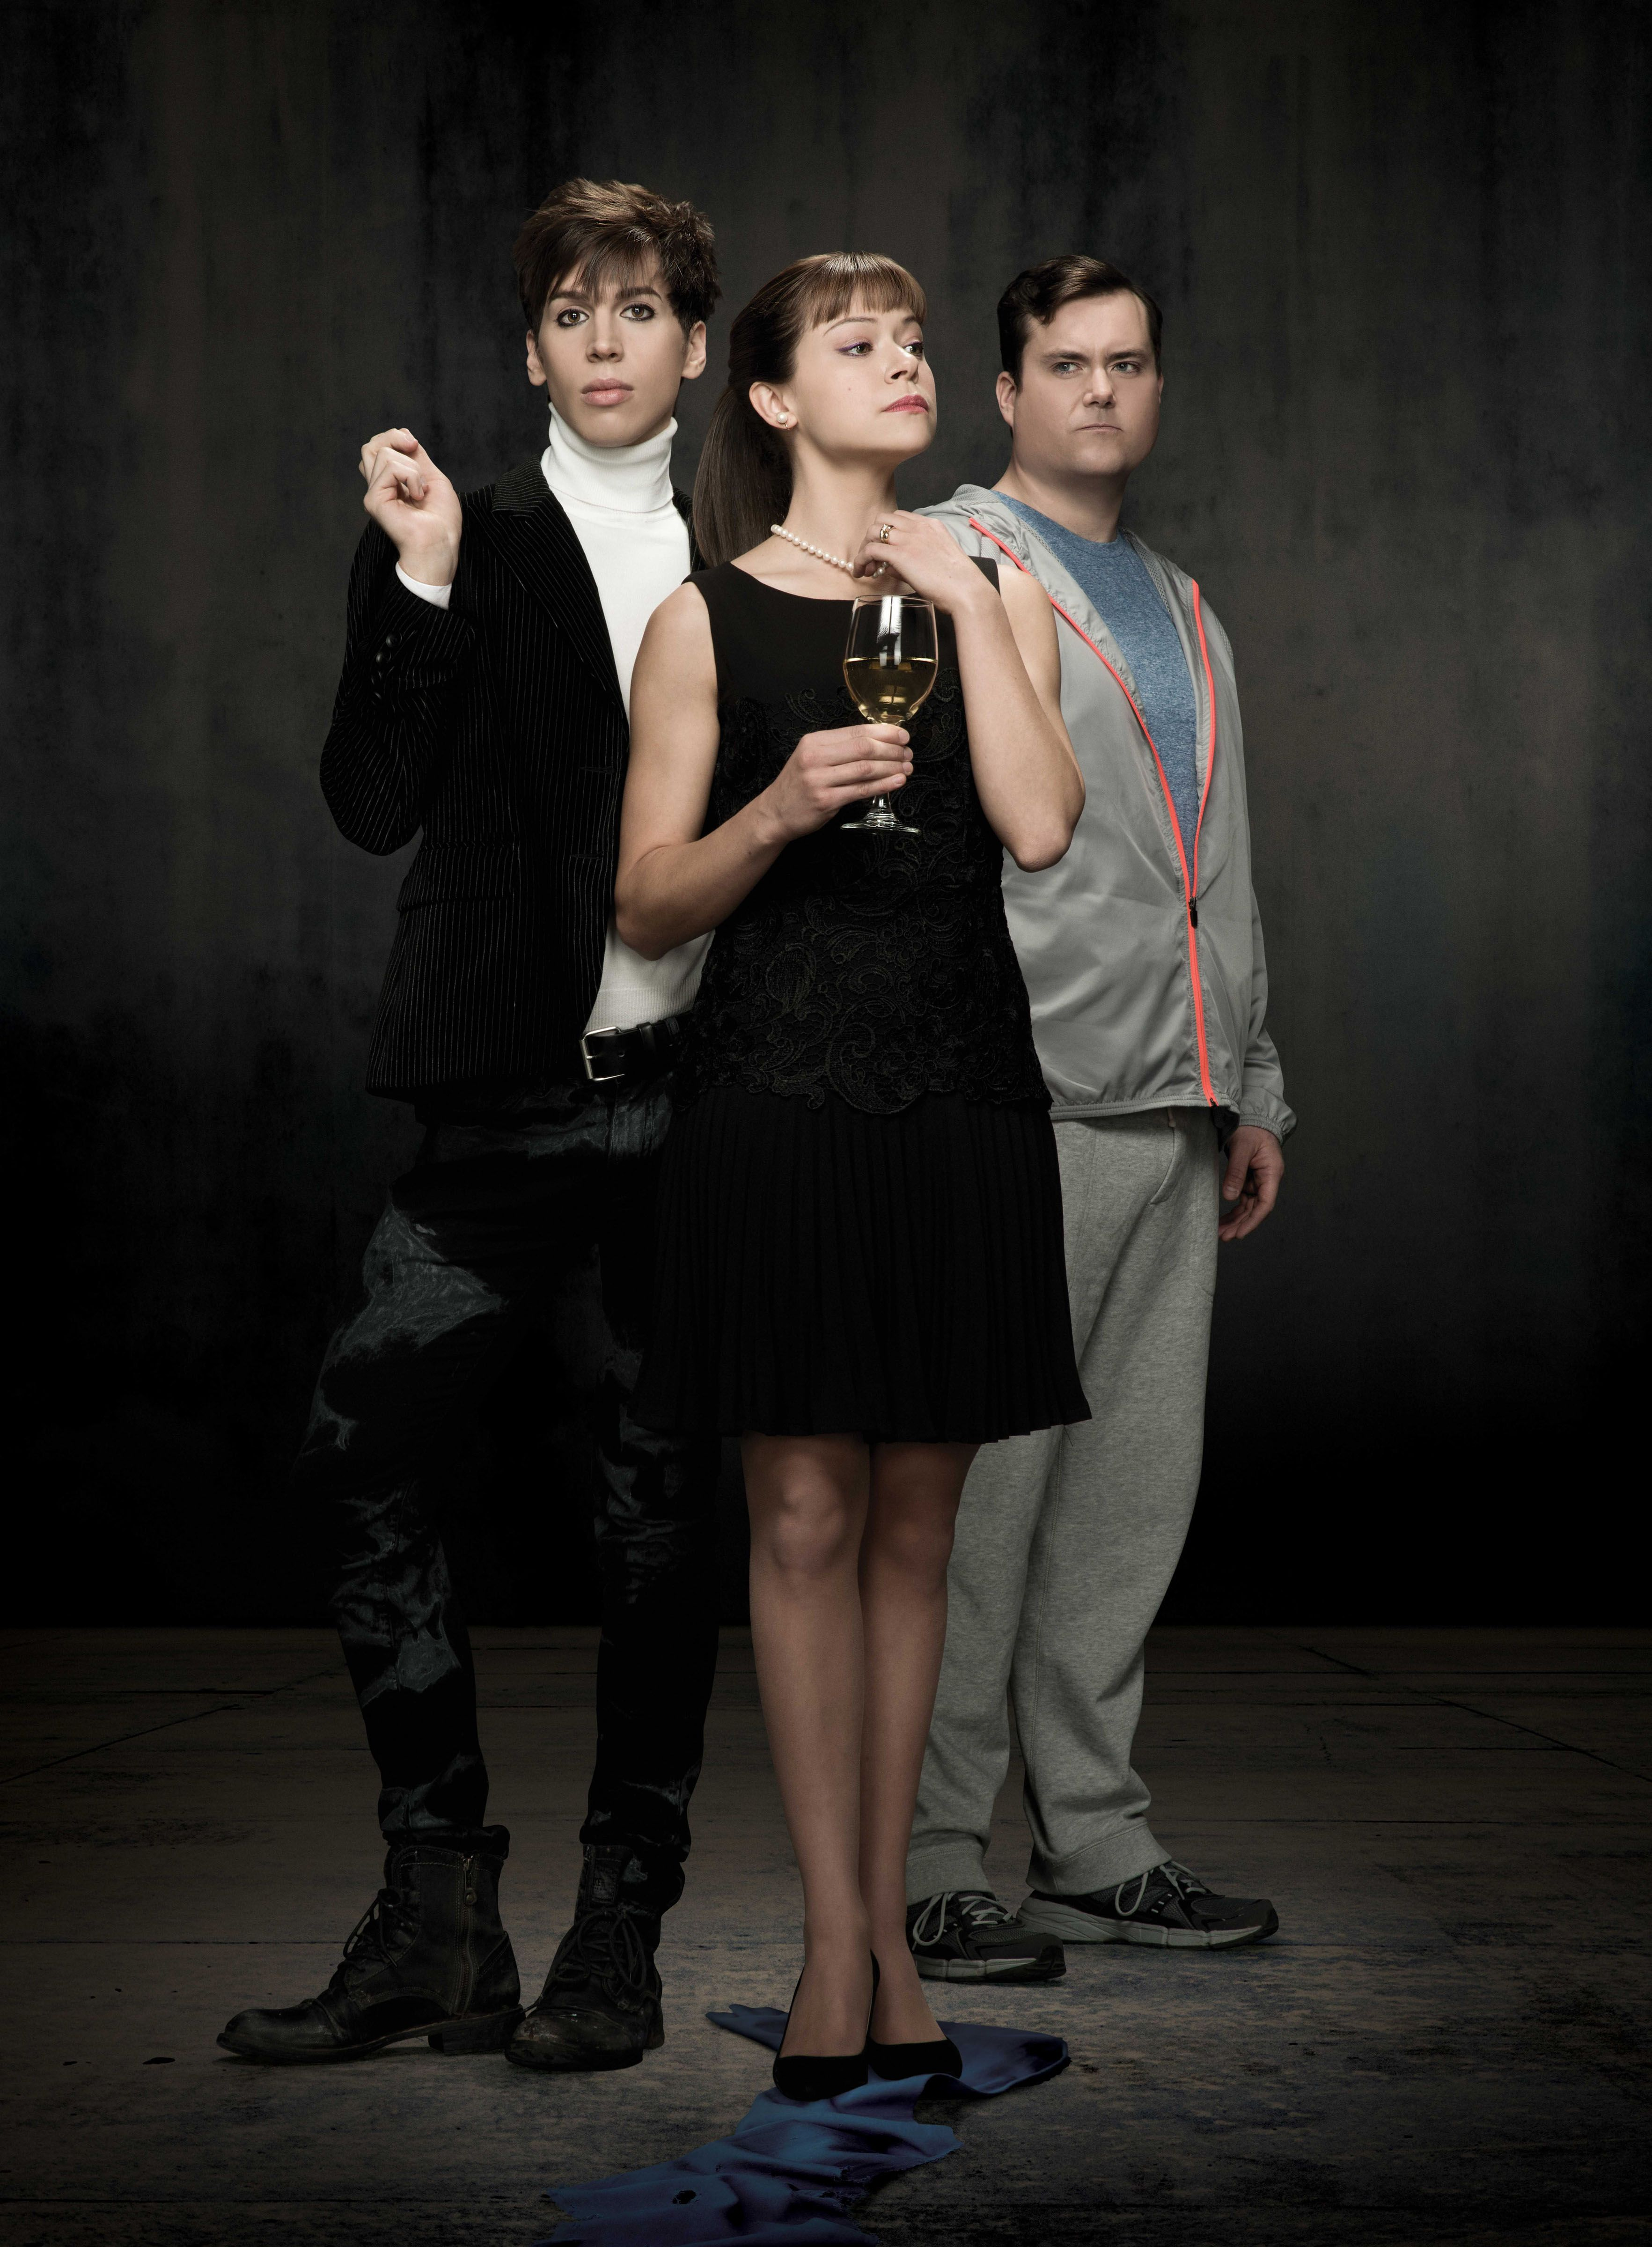 Orphan Black S2 Cast Promotional Photo Fantasy Tv Shows